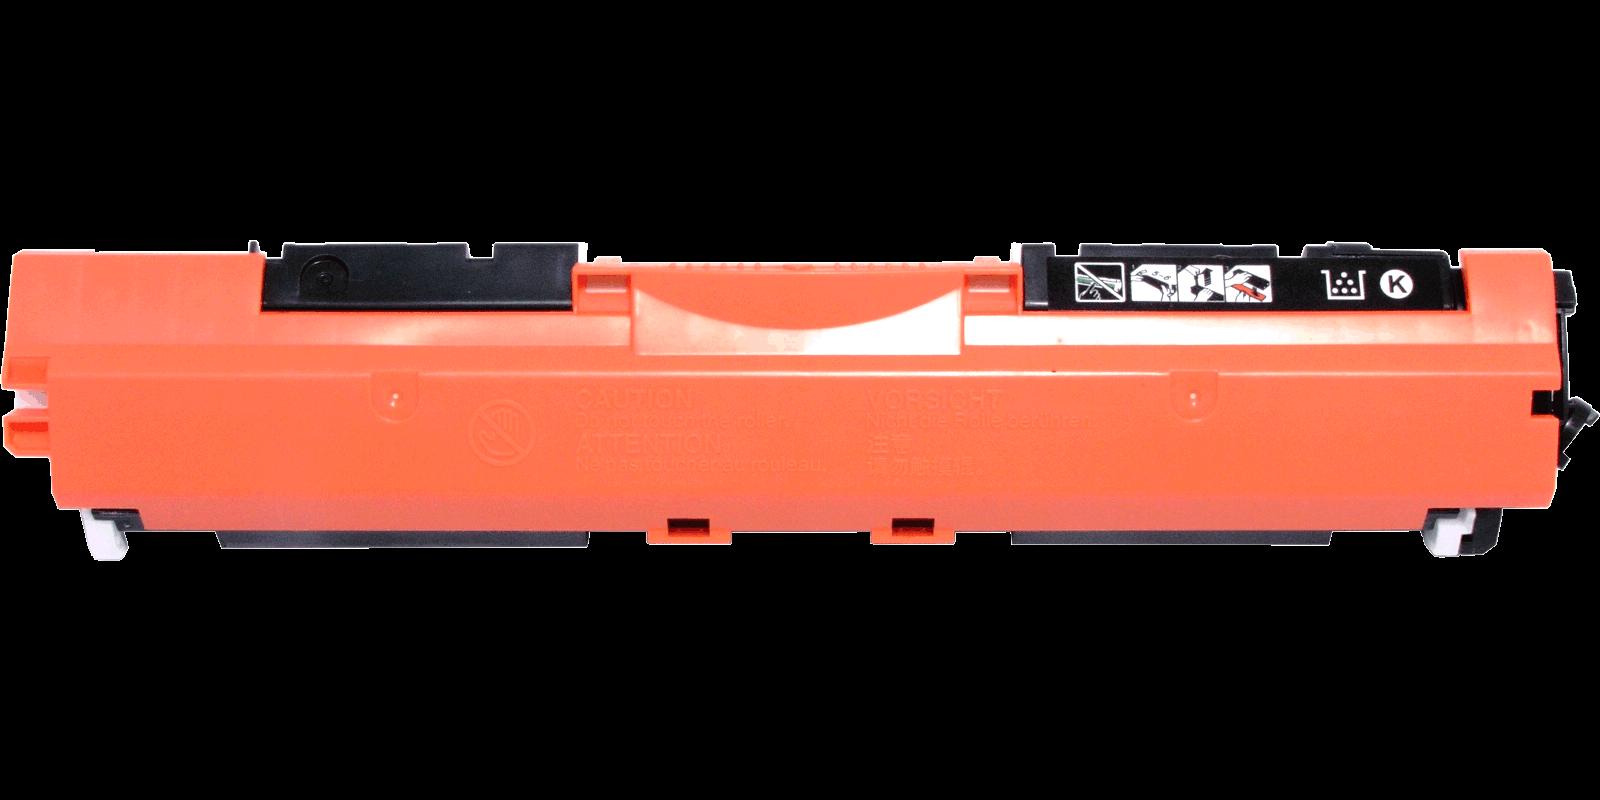 ULTRA №126A CE310A/Cartridge 729Bk, черный, для HP/Canon, до 1200 стр.